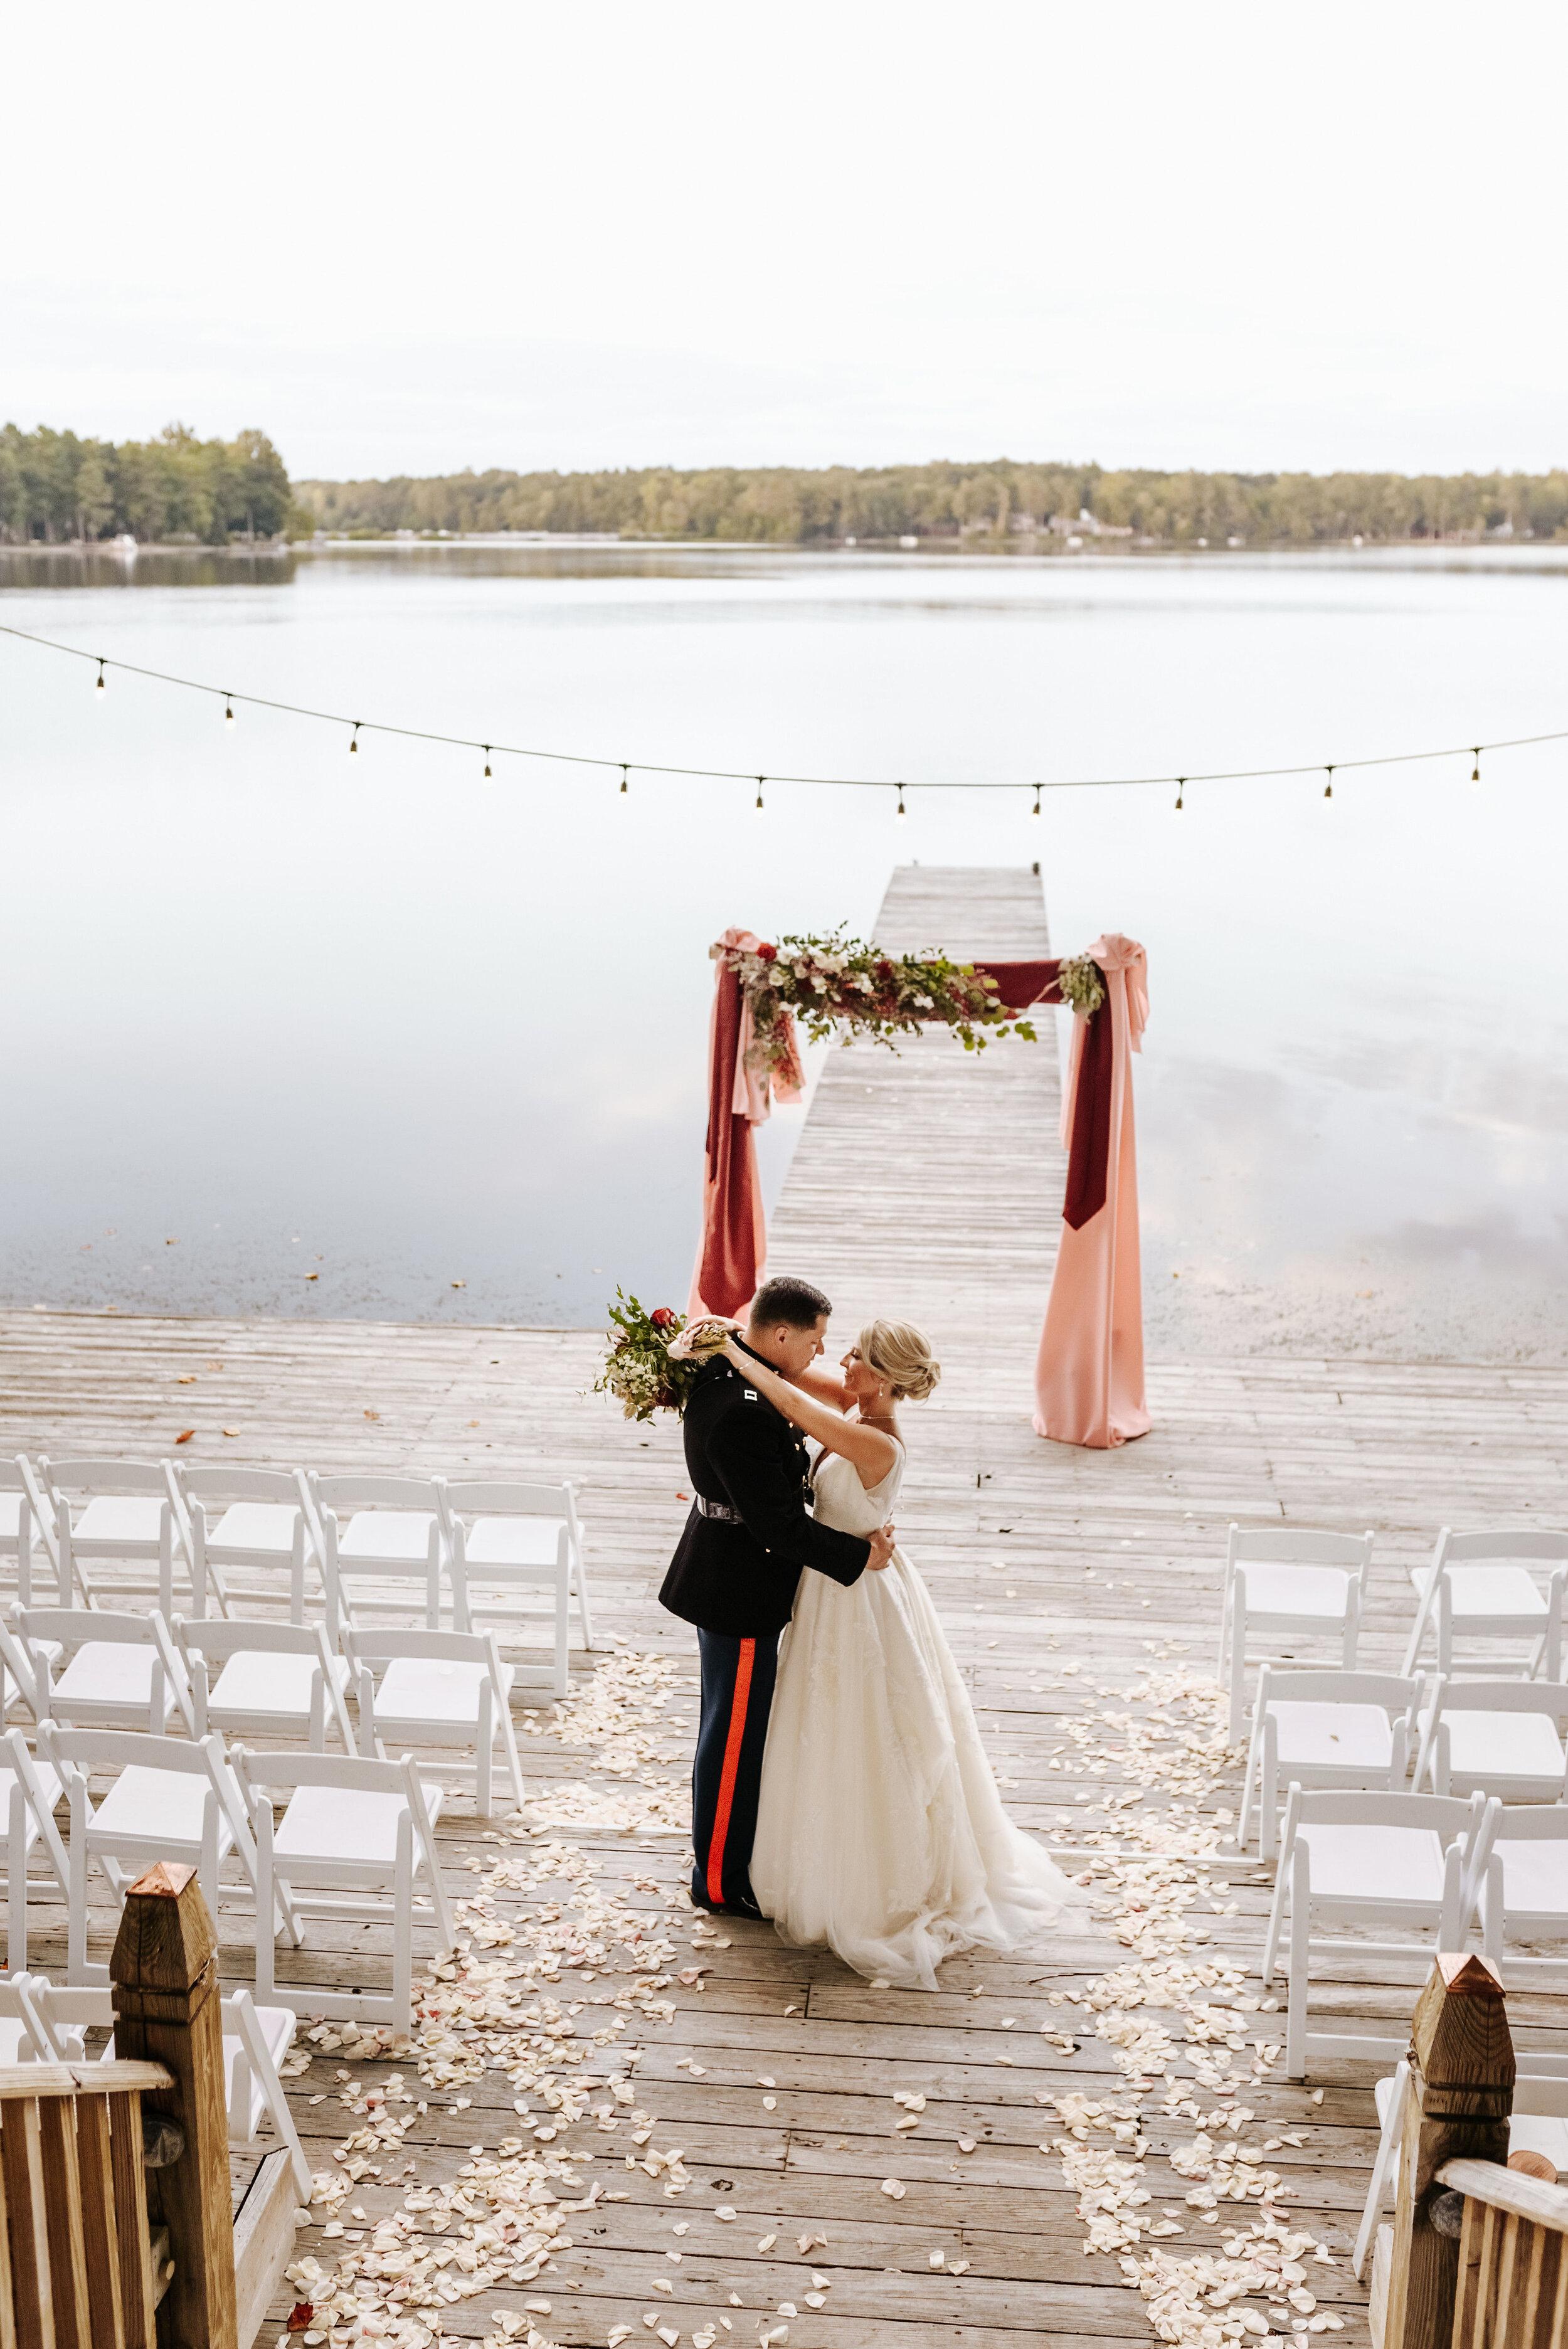 Emily_Mike_Wedding_Celebrations_at_the_Reservoir_Pool_Pavilion_Richmond_Virginia_Wedding_Photographer_Photography_by_V_97.jpg